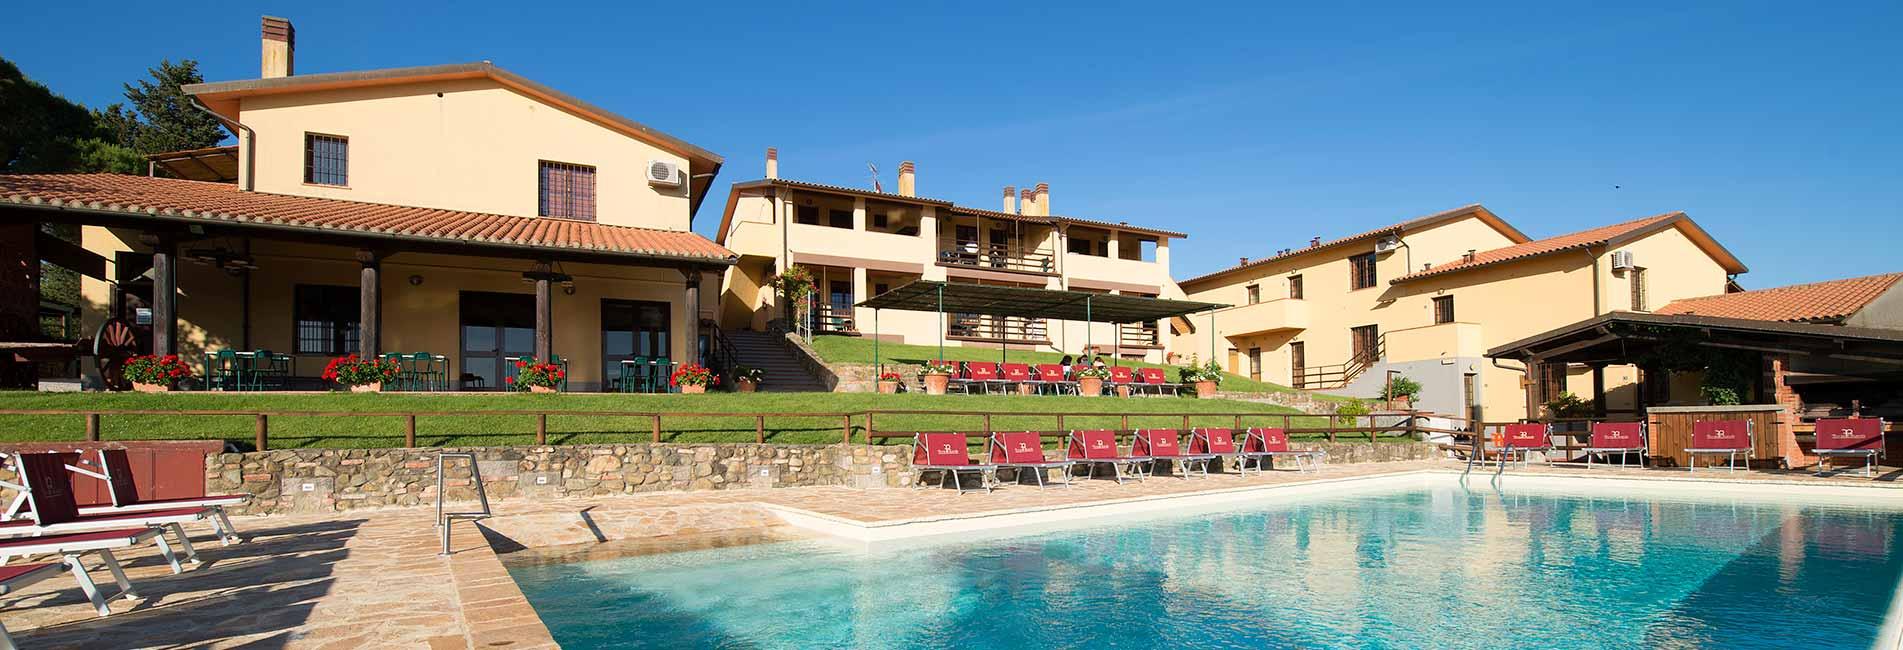 borgo_filicardo_apartments_chianti_tuscany2